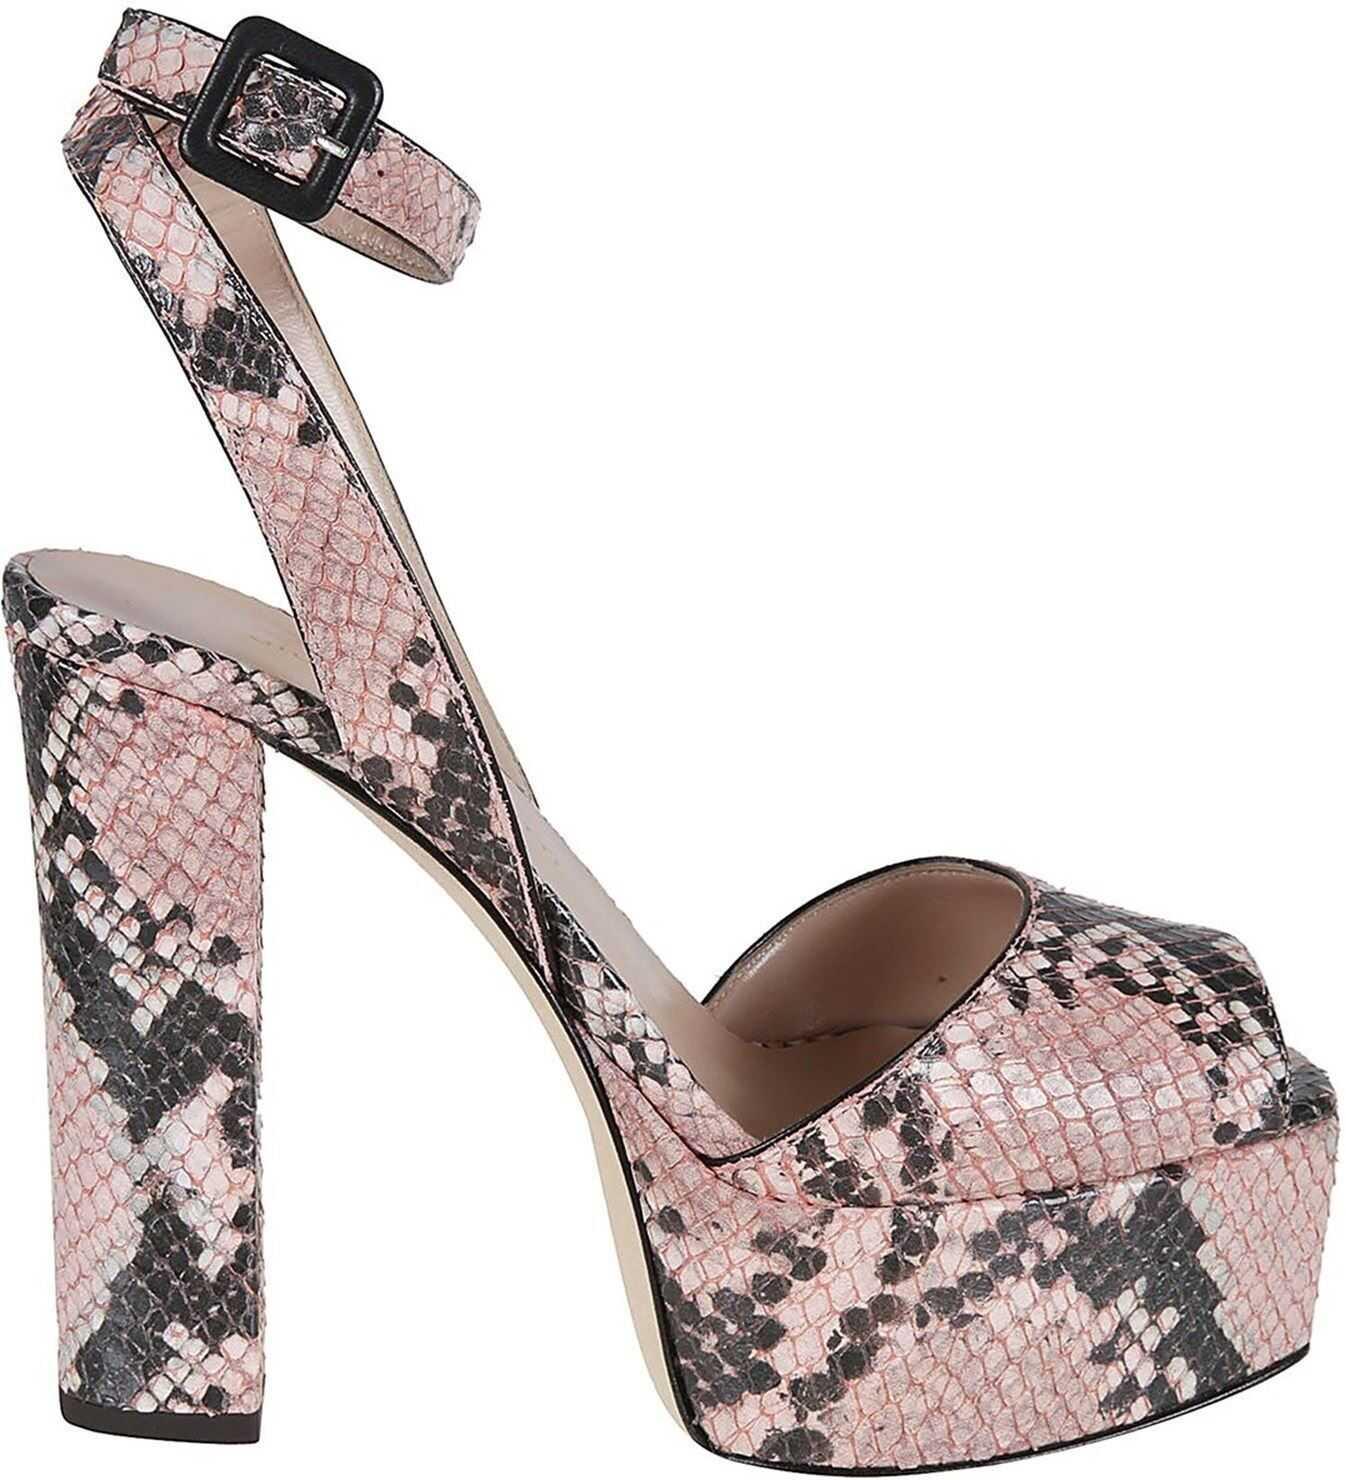 Giuseppe Zanotti Betty Reptile Printed Leather Sandals Pink